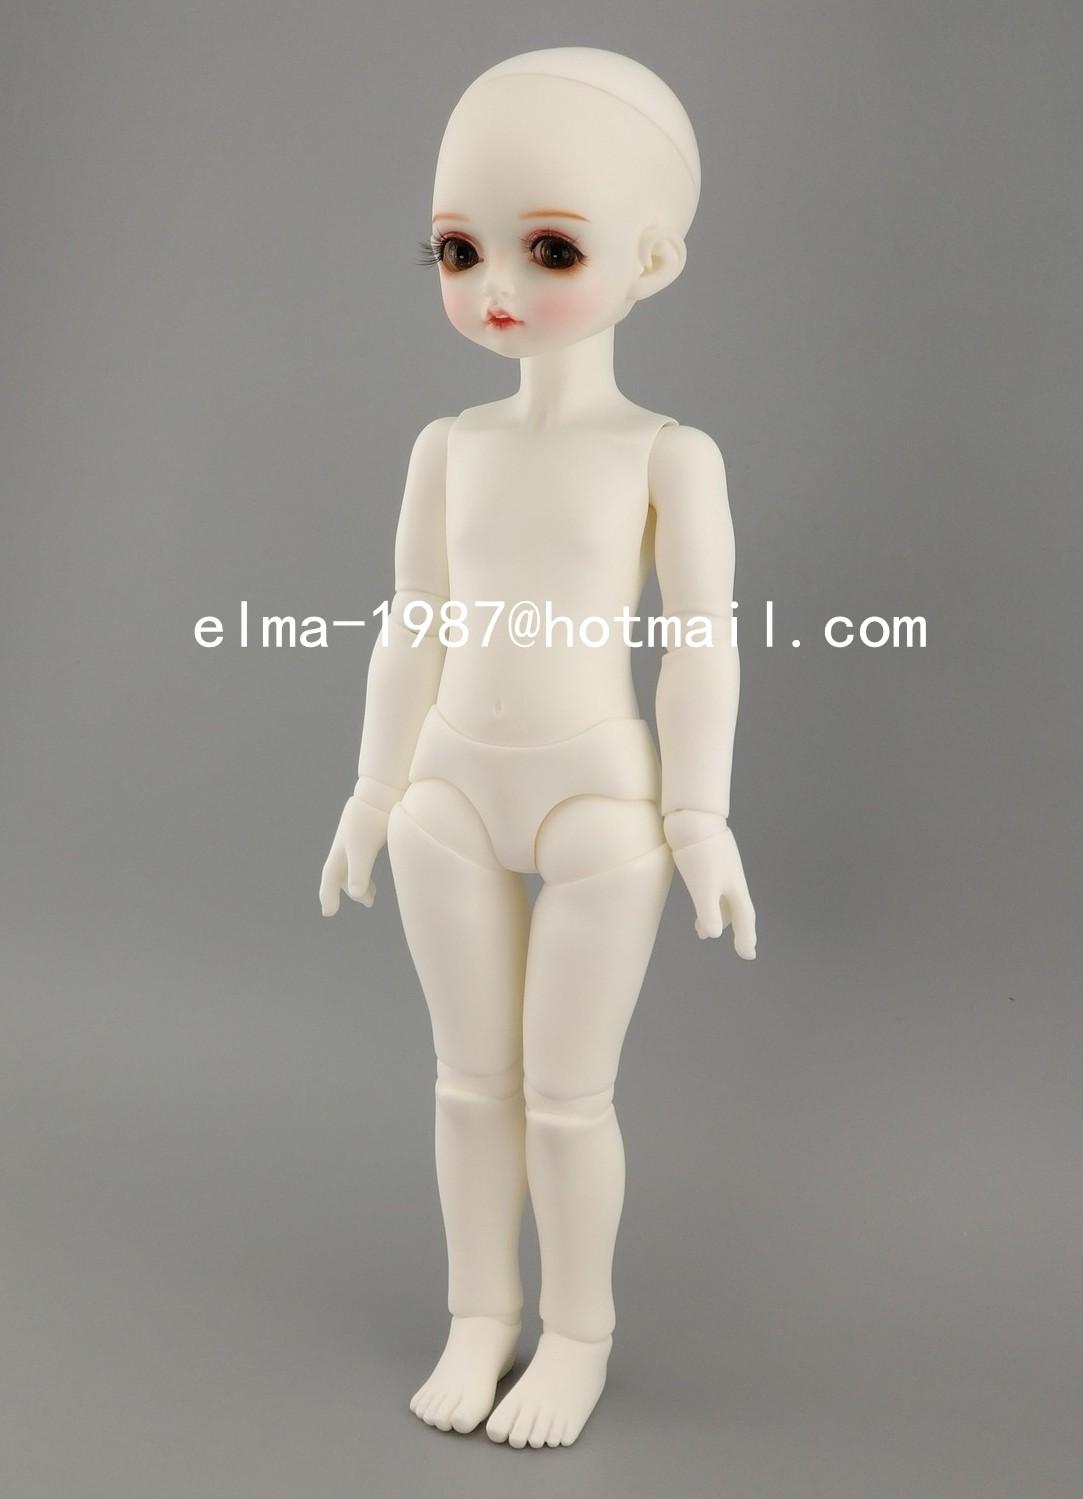 white-skin-bambi_2.jpg